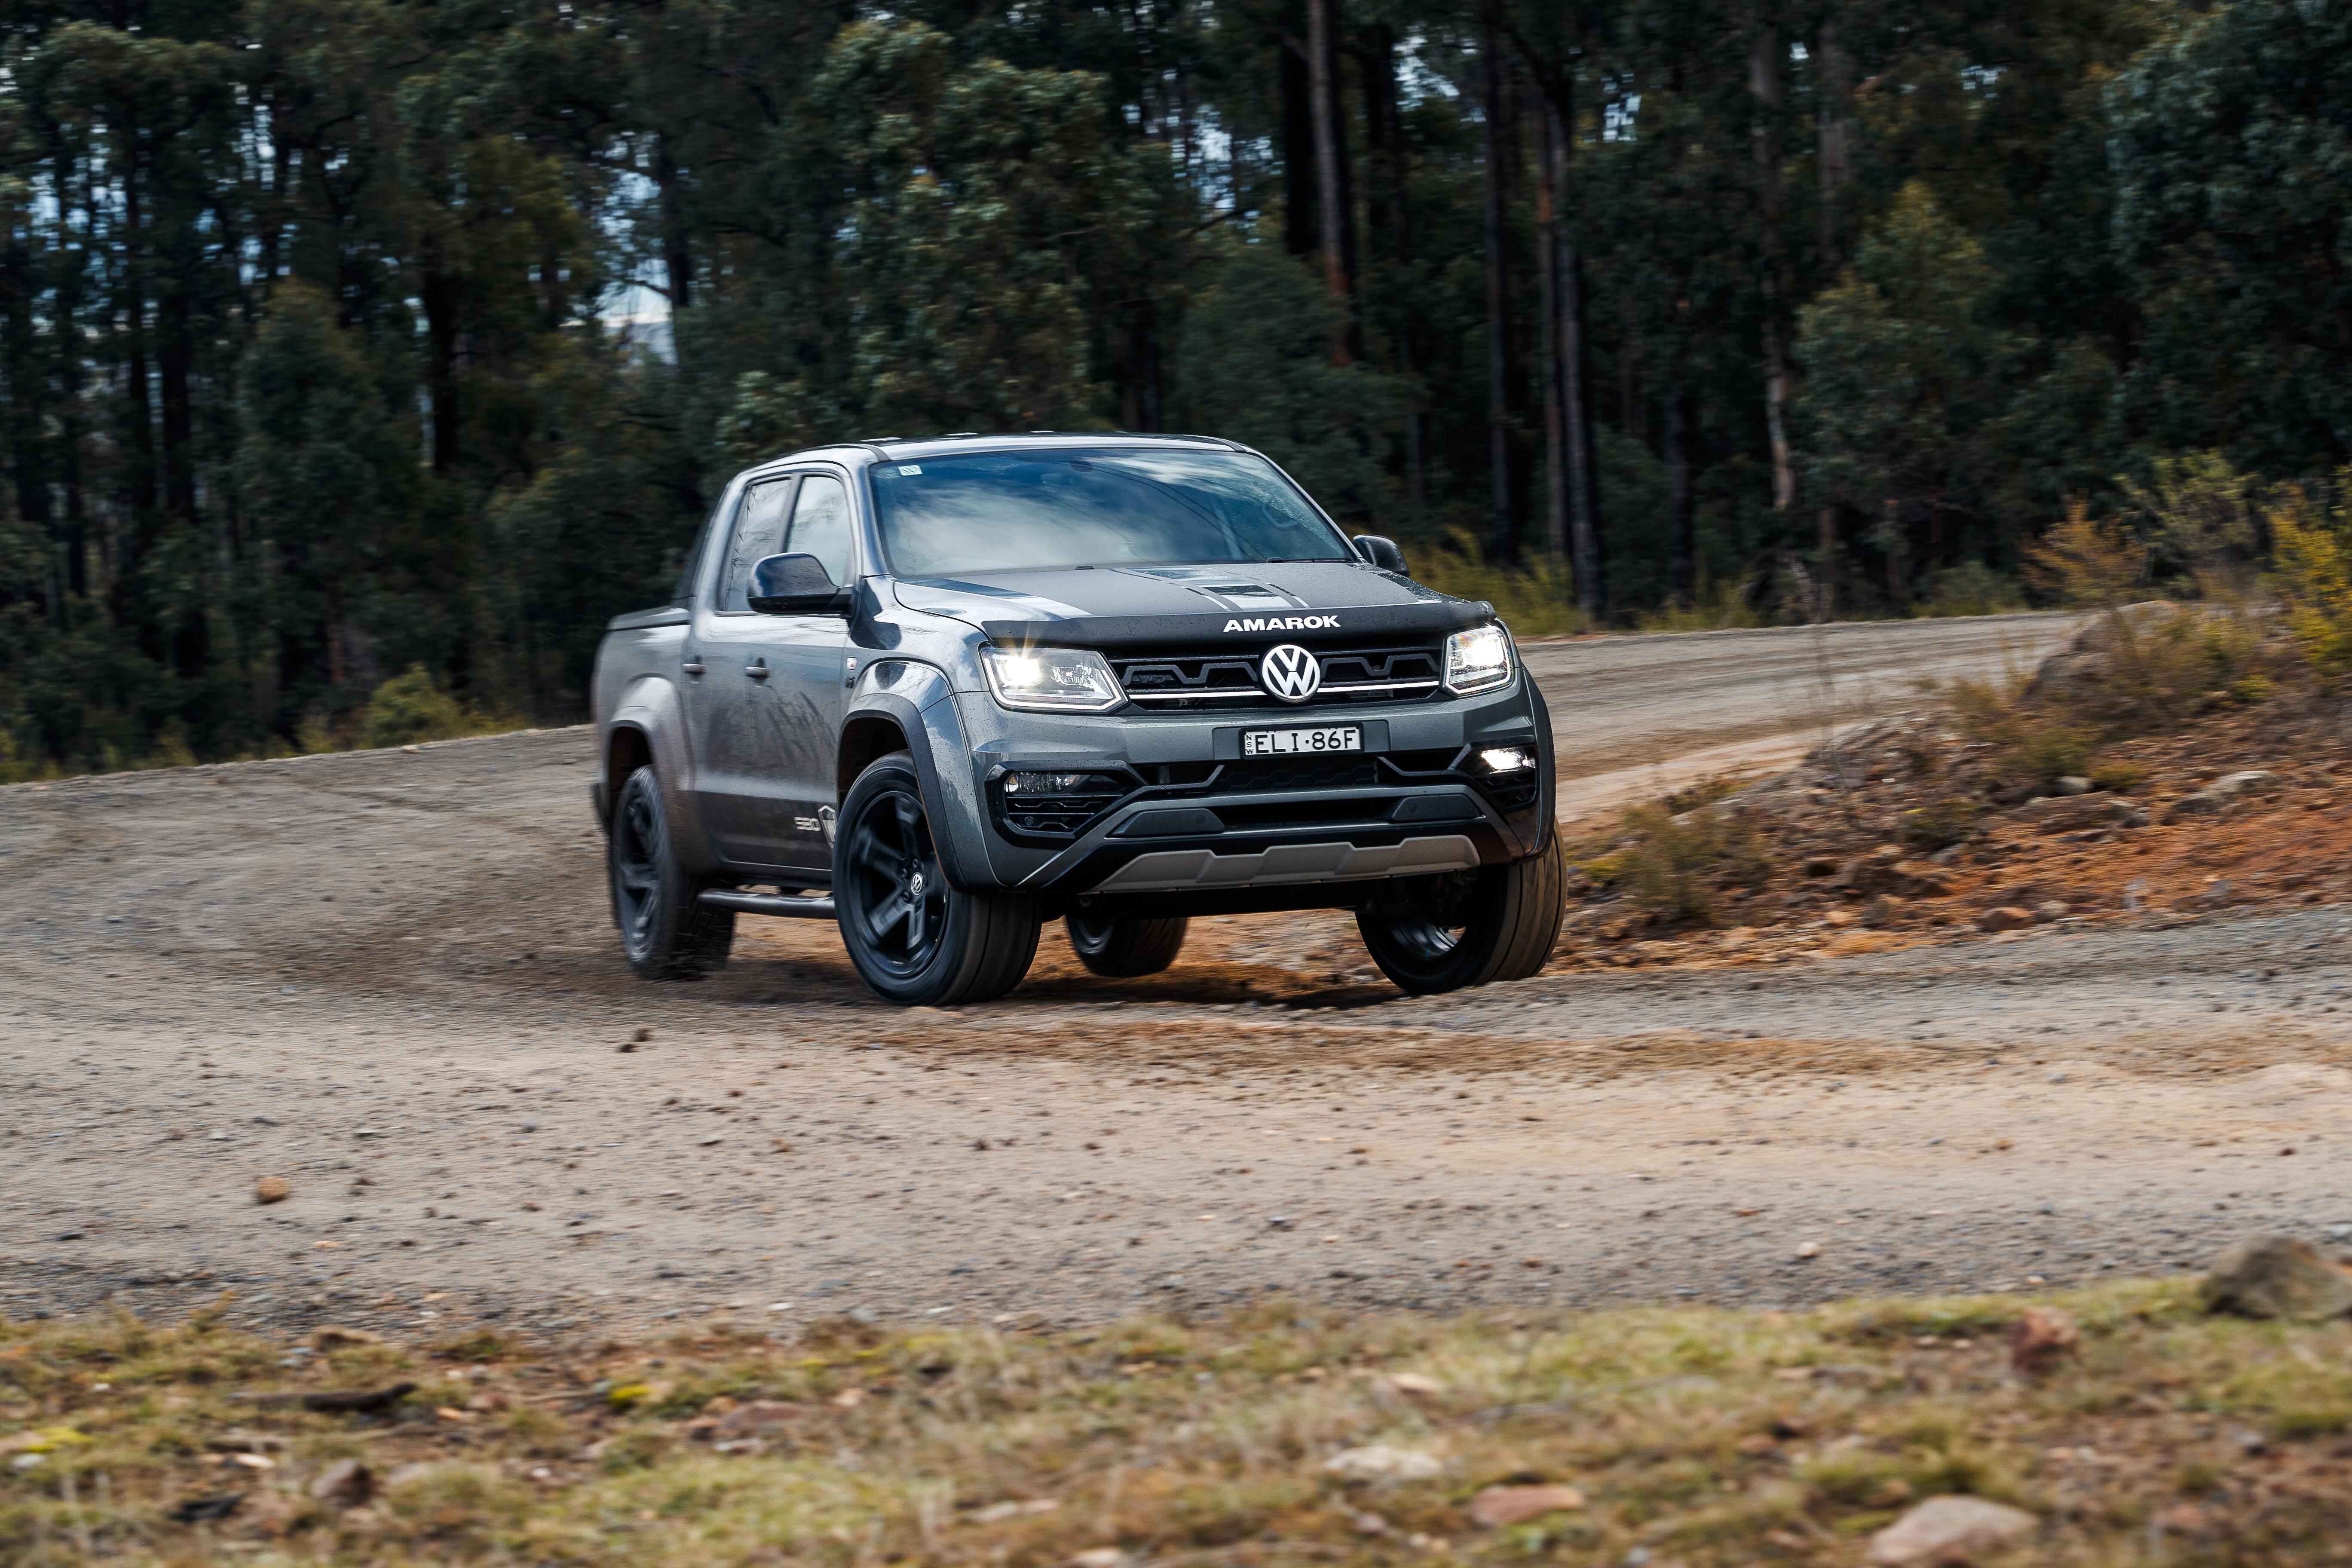 4 X 4 Australia Reviews 2021 July 2021 2021 Volkswagen Amarok W 580 S 21